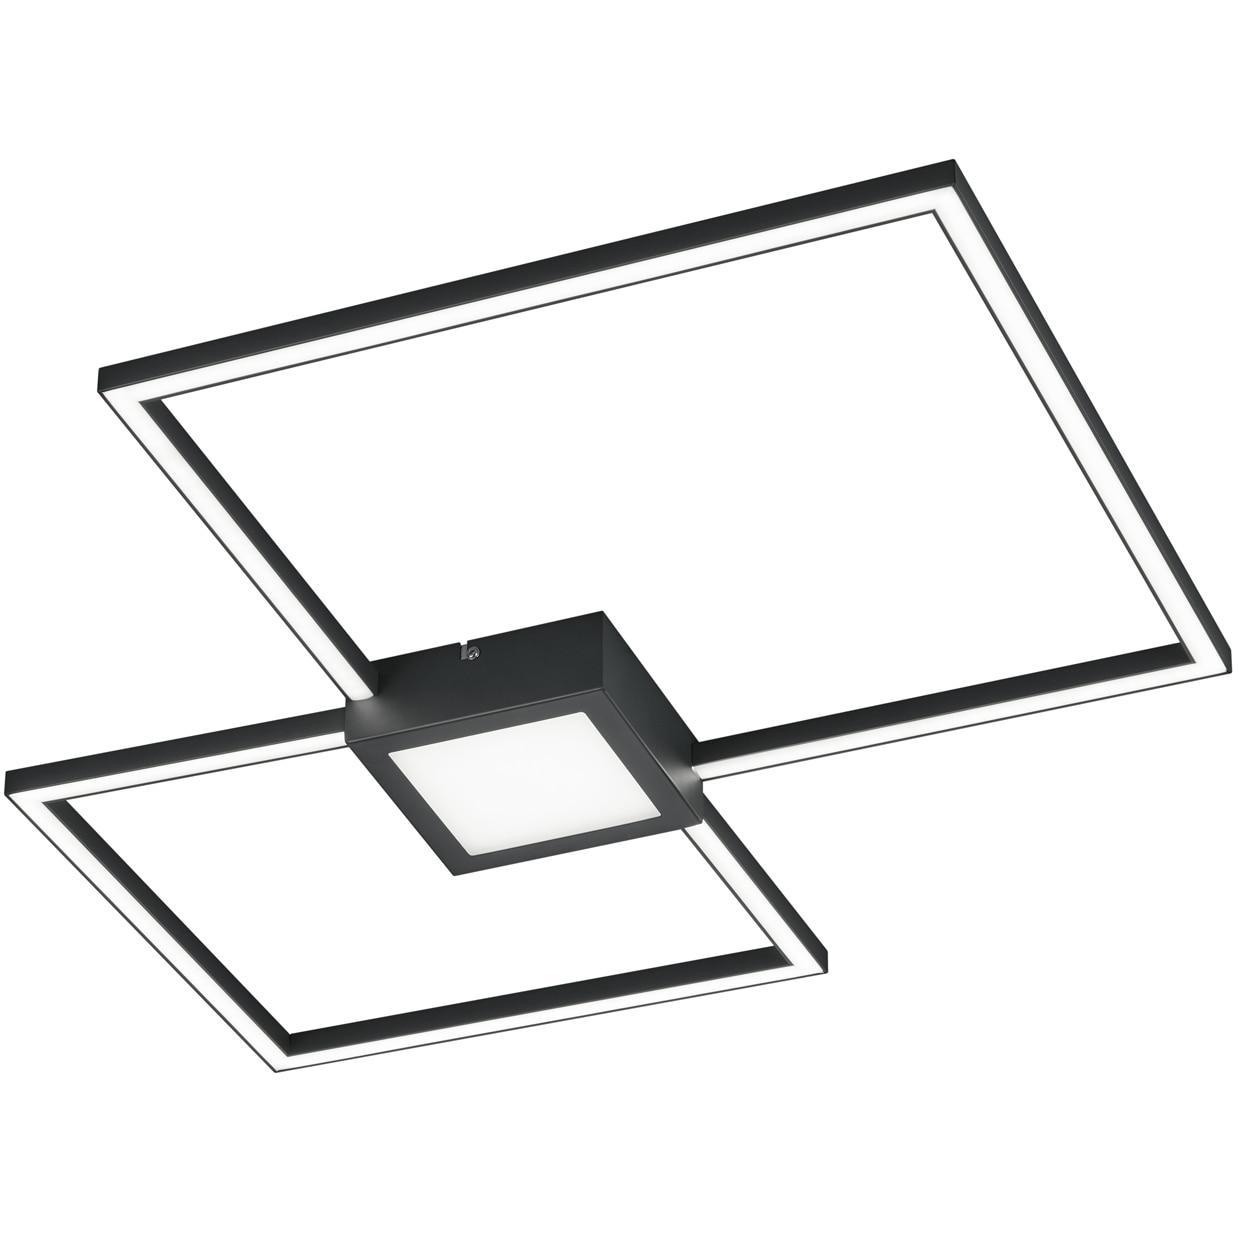 Fotografie Lustra LED integrat Trio Hydra Square, tip plafoniera, cu intrerupator dimmer, 28W, 2600 lm, 3000K, IP20, metal, Antracit